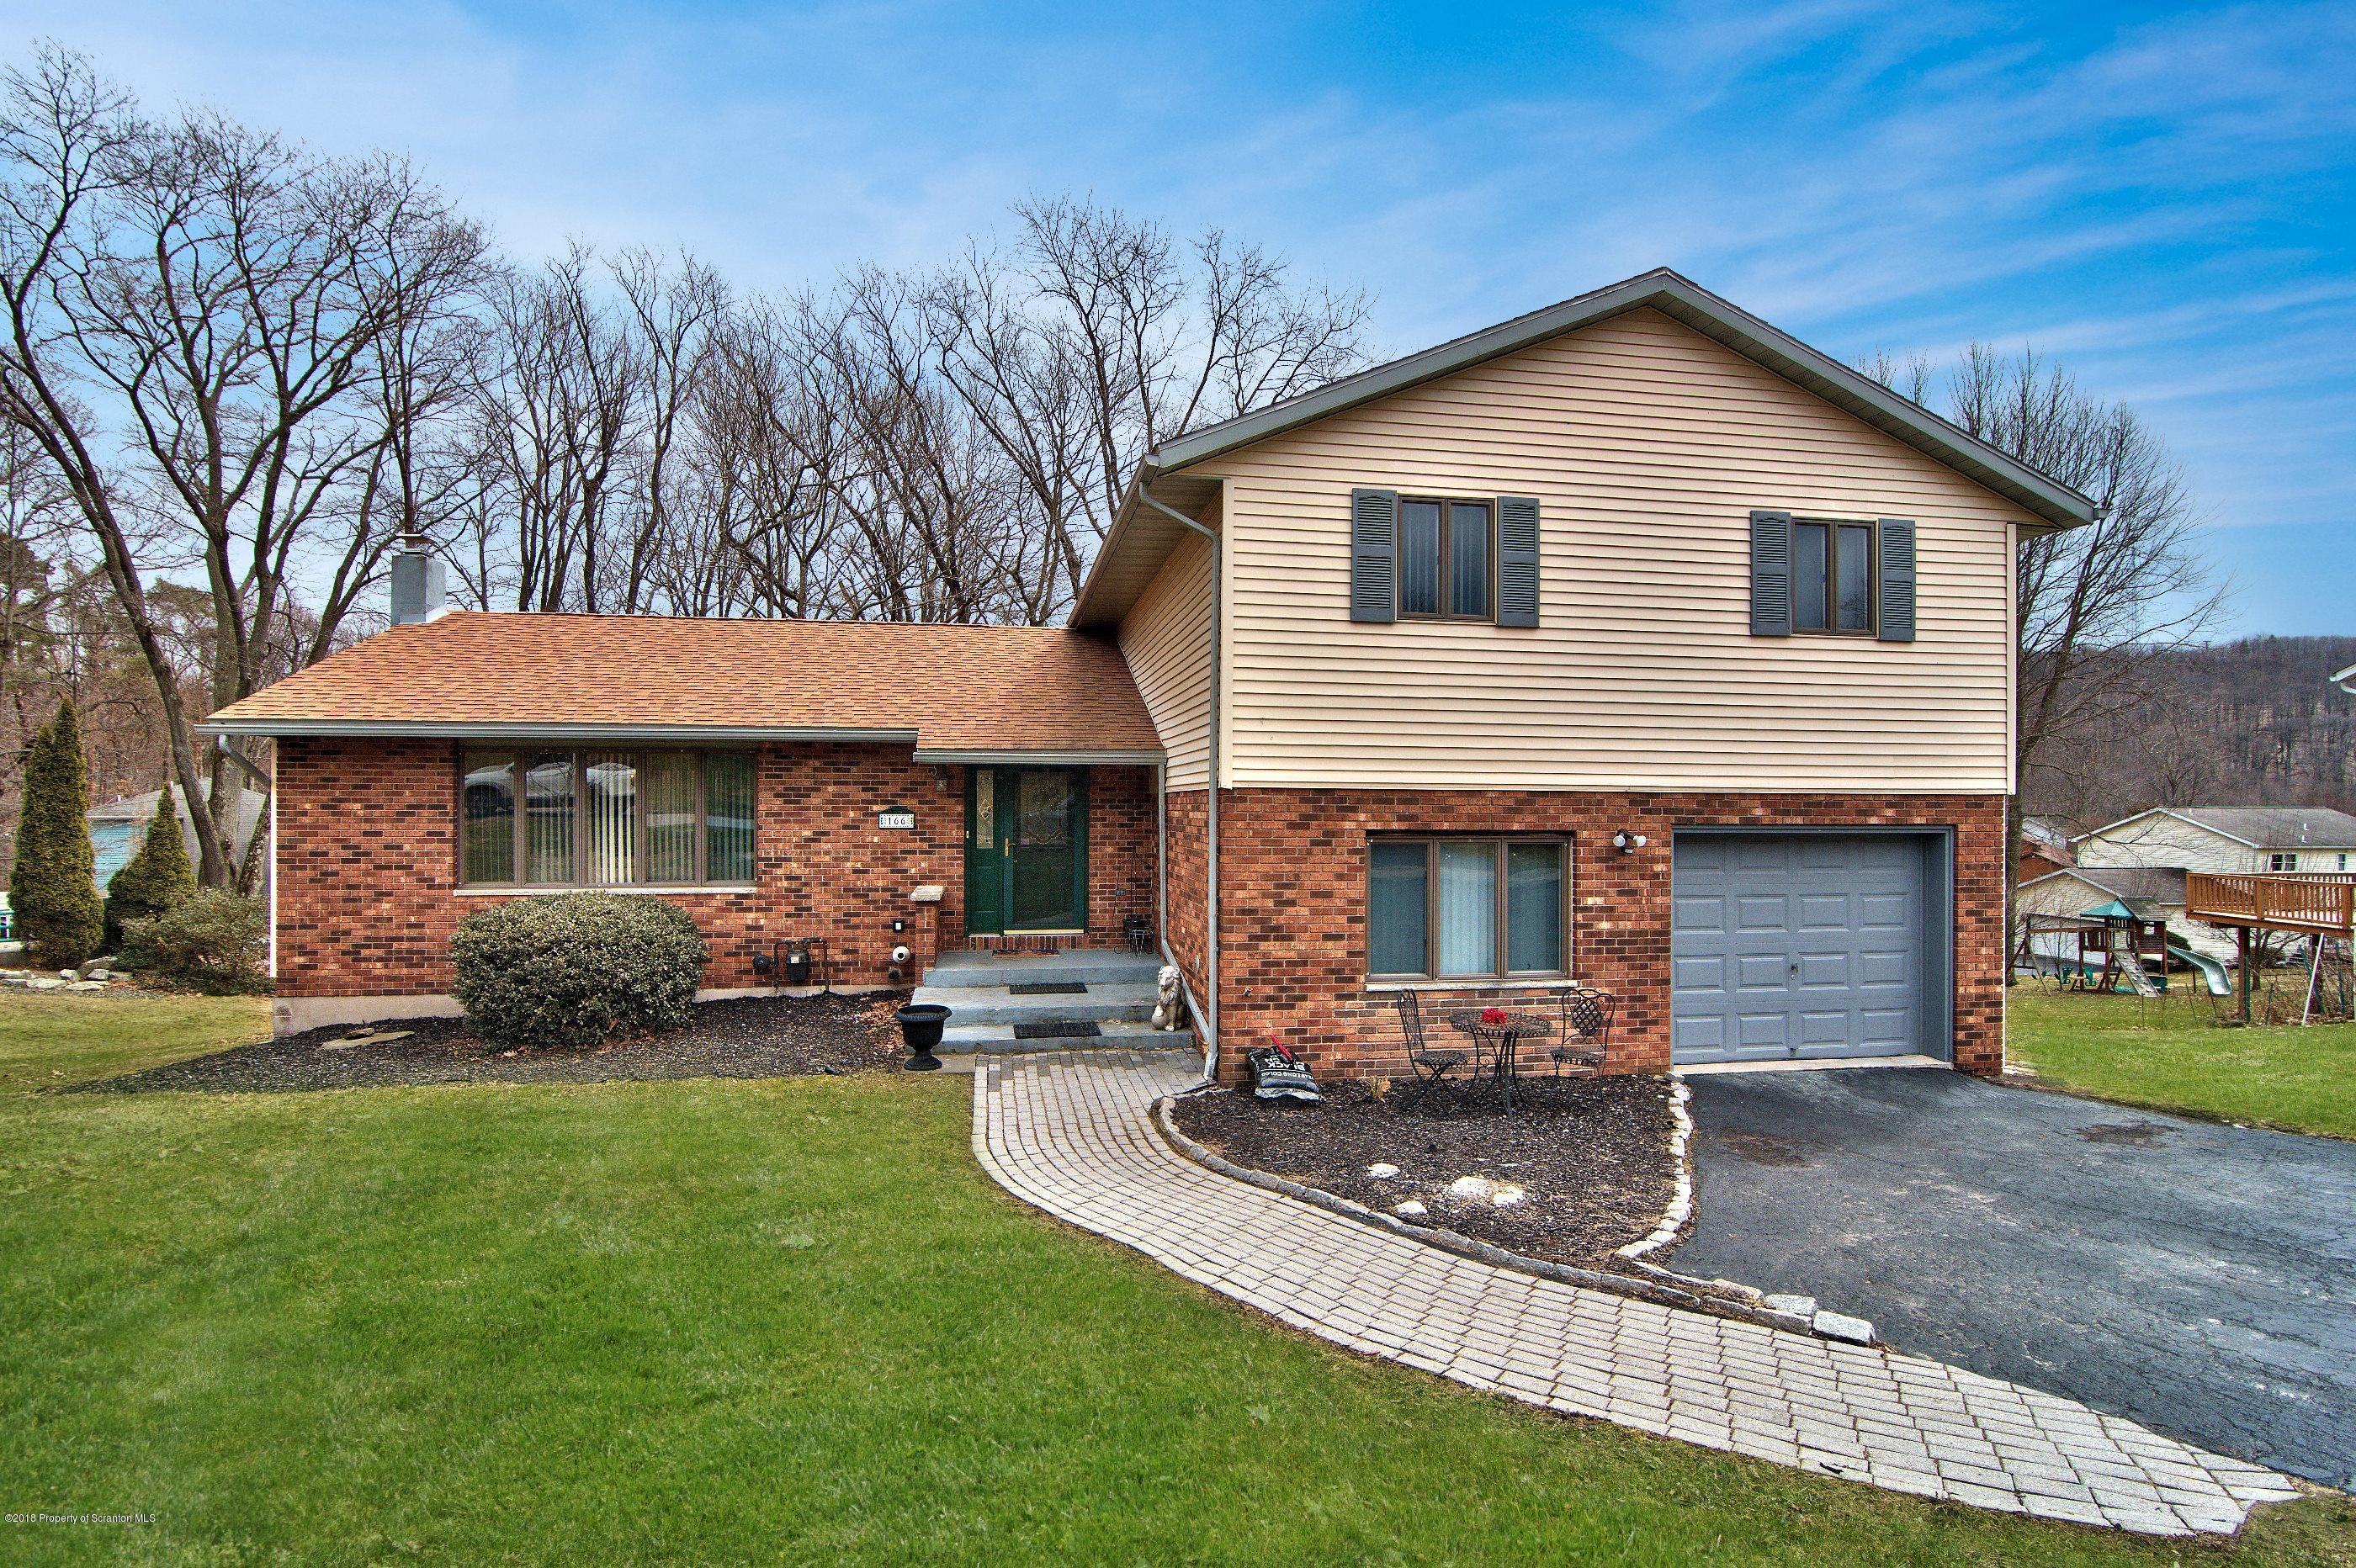 166 Edgewood Dr,Clarks Summit,Pennsylvania 18411,4 Bedrooms Bedrooms,9 Rooms Rooms,2 BathroomsBathrooms,Residential,Edgewood,18-1336